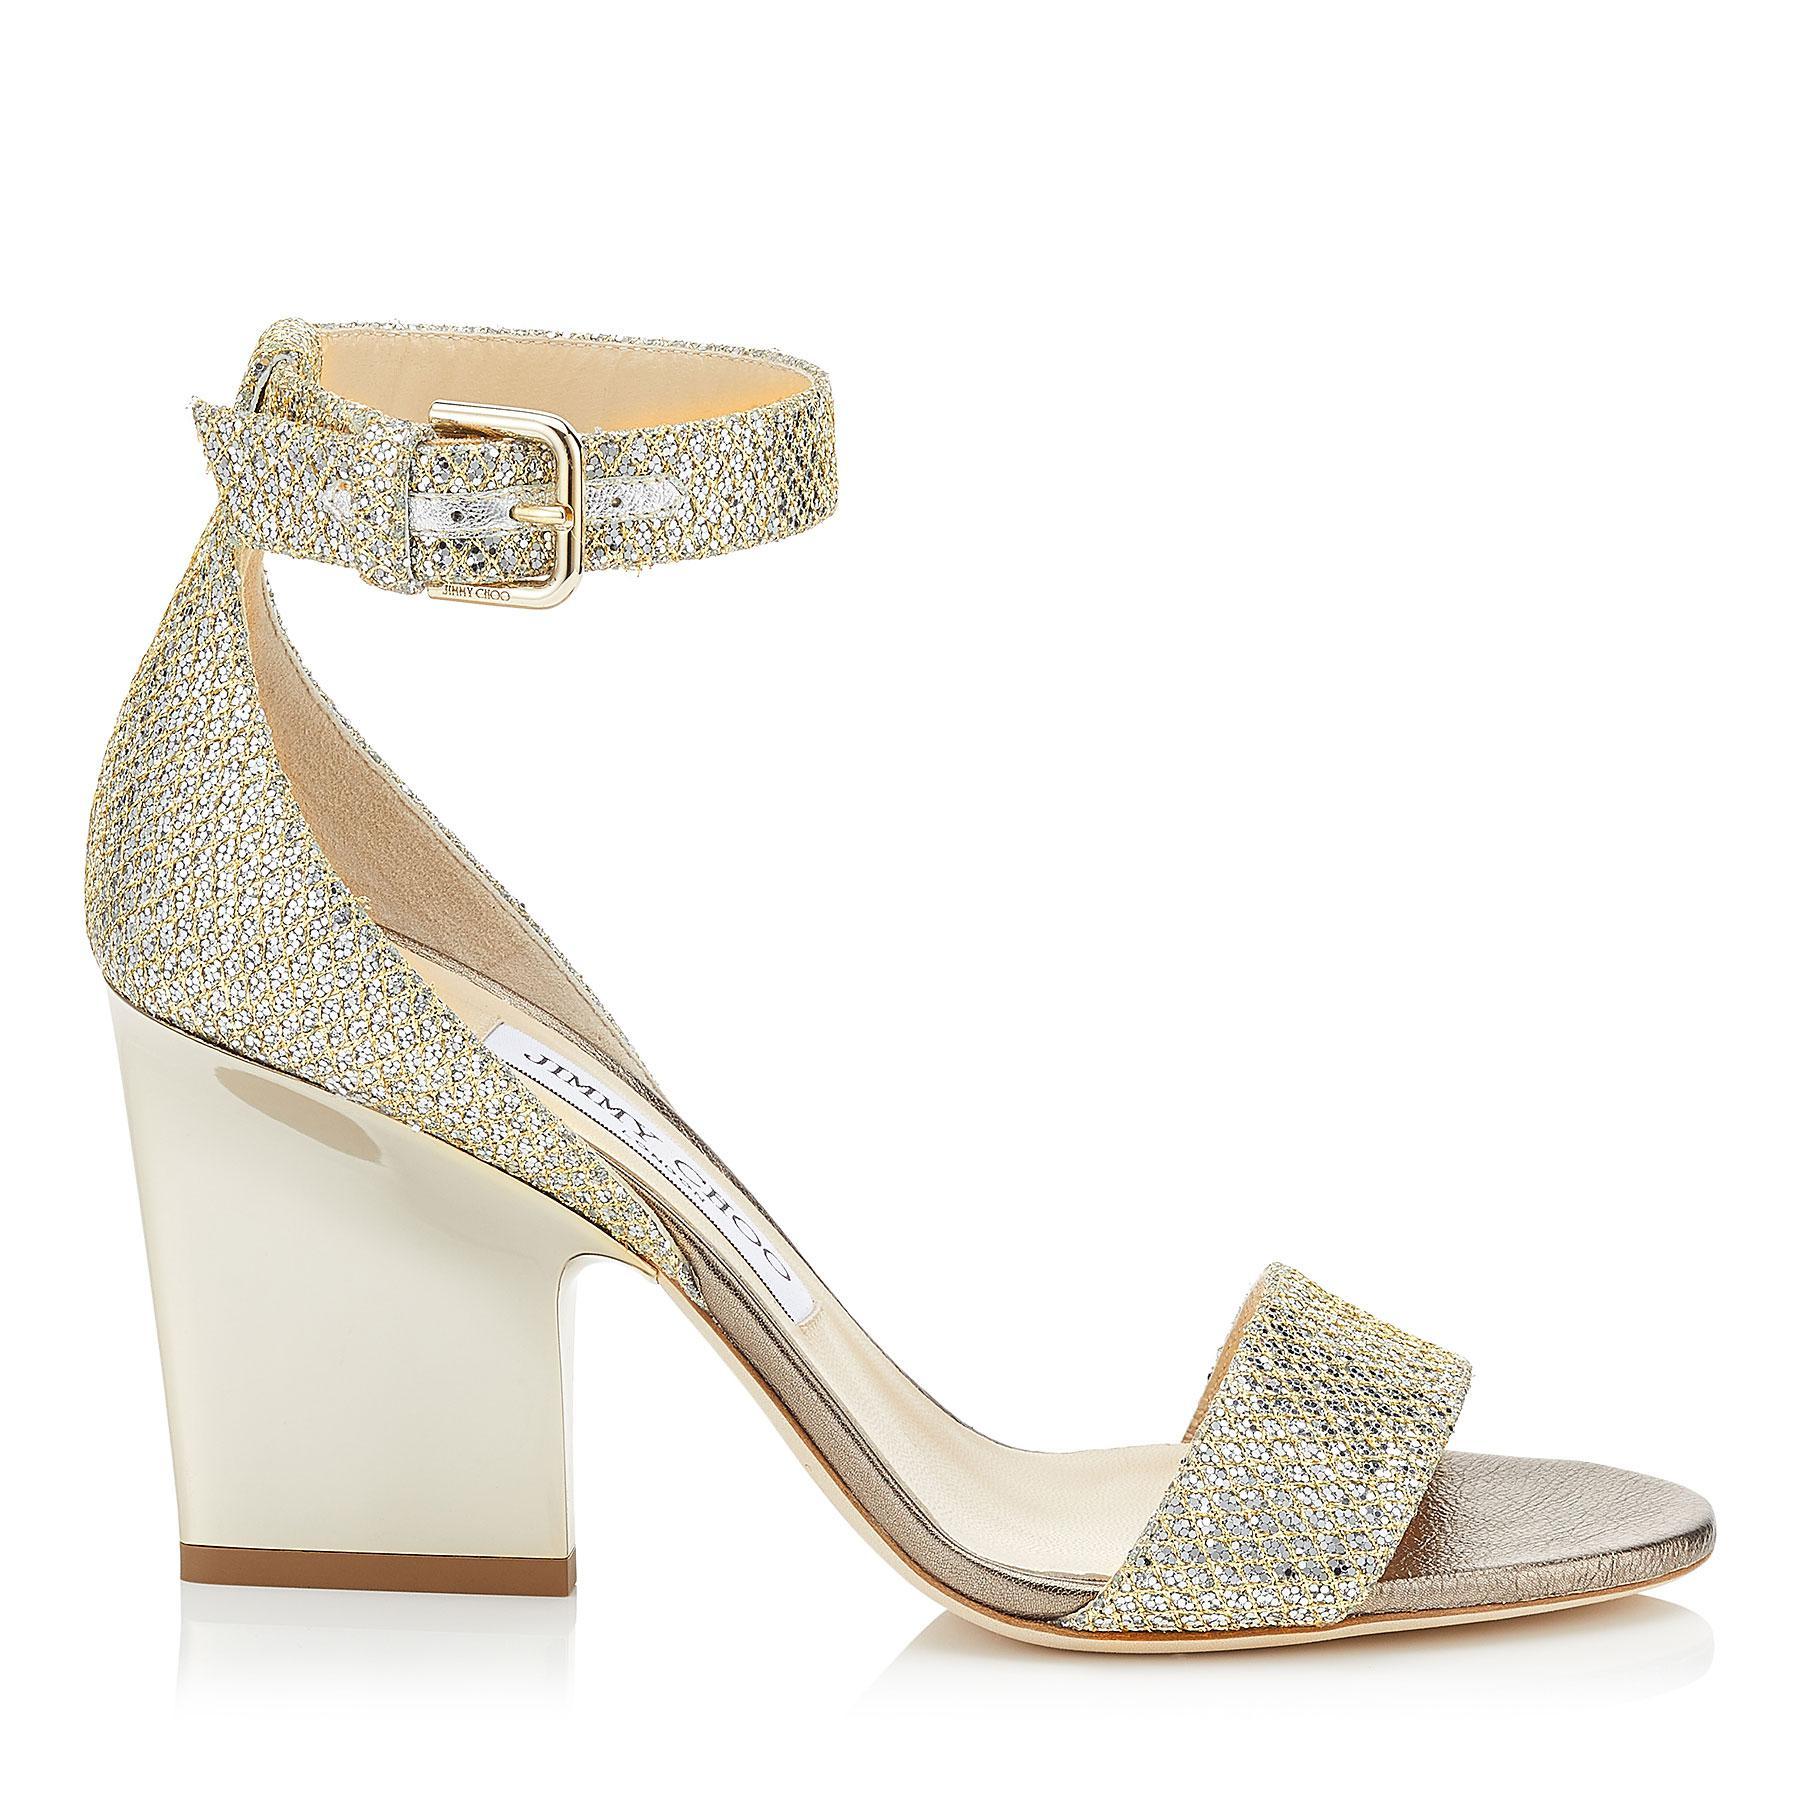 ed54251b5f7 Lyst - Jimmy Choo Edina 85 Champagne Glitter Fabric Wedges in Metallic